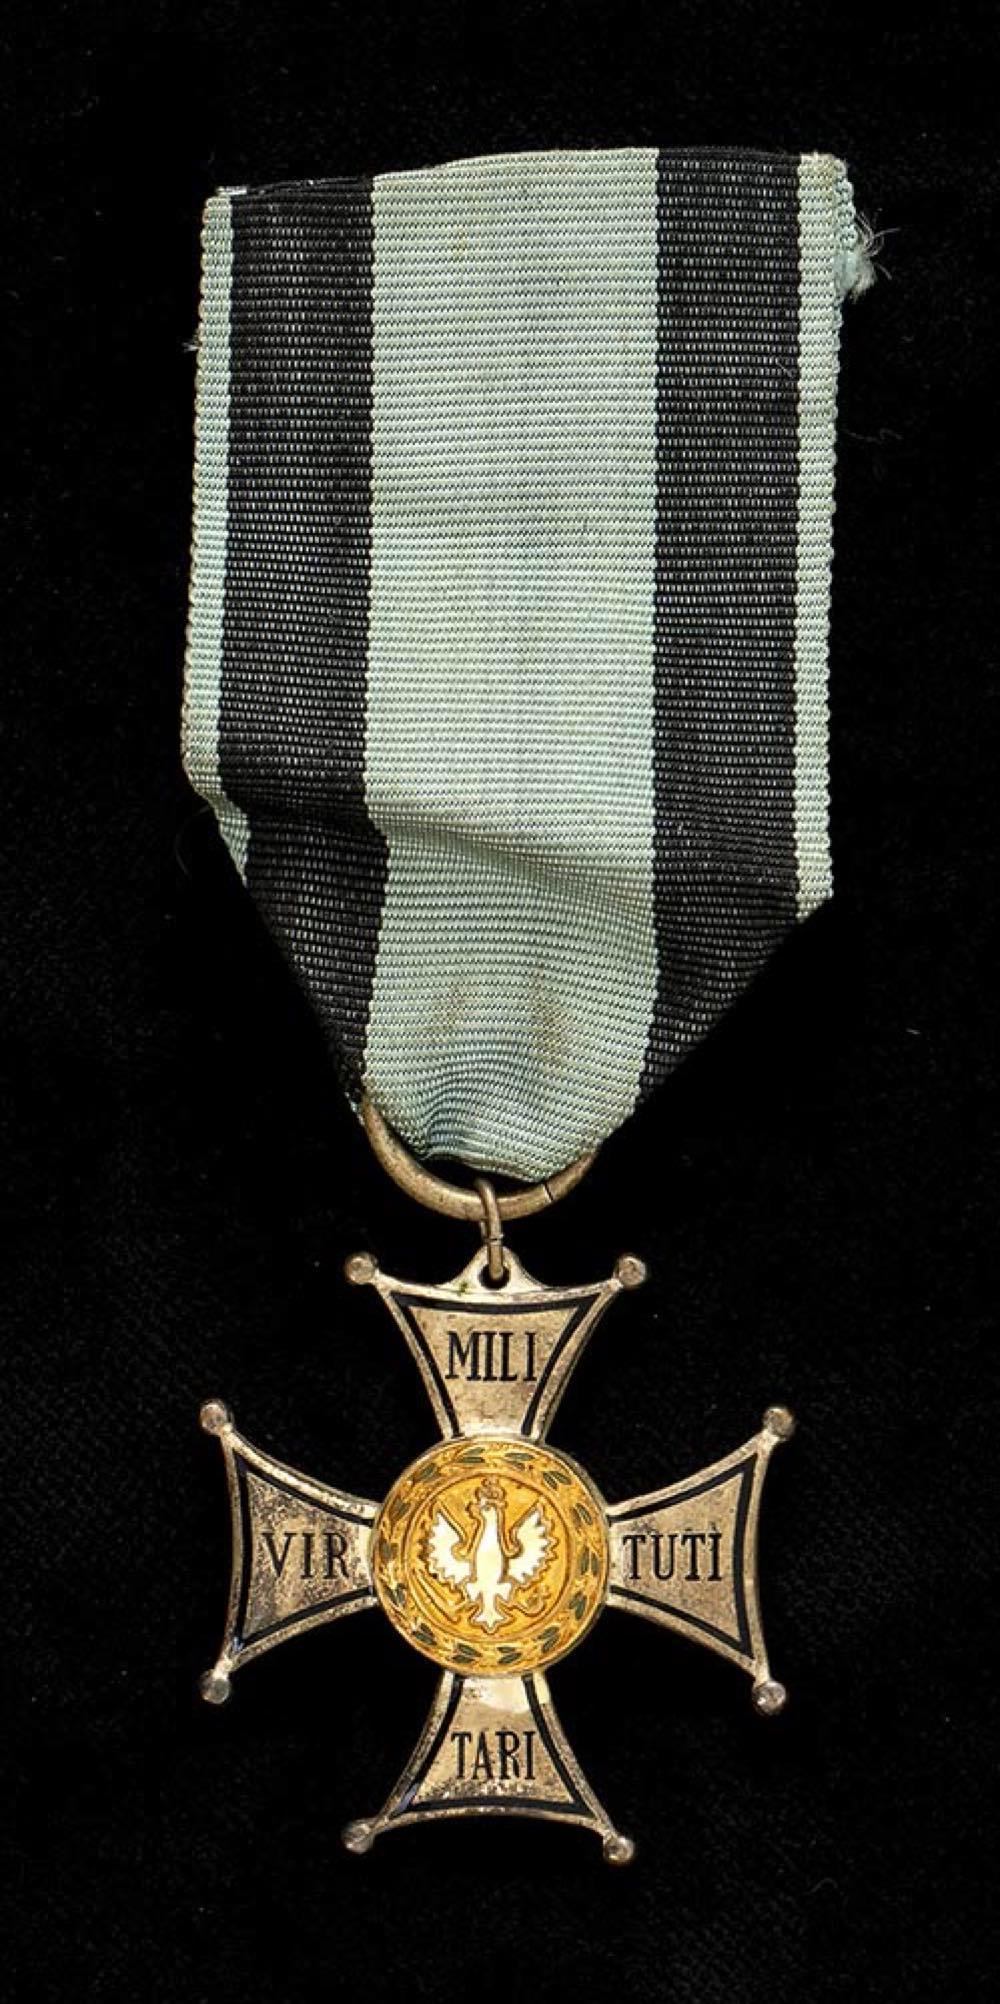 A militari vuirtuti cross, Panasiuk